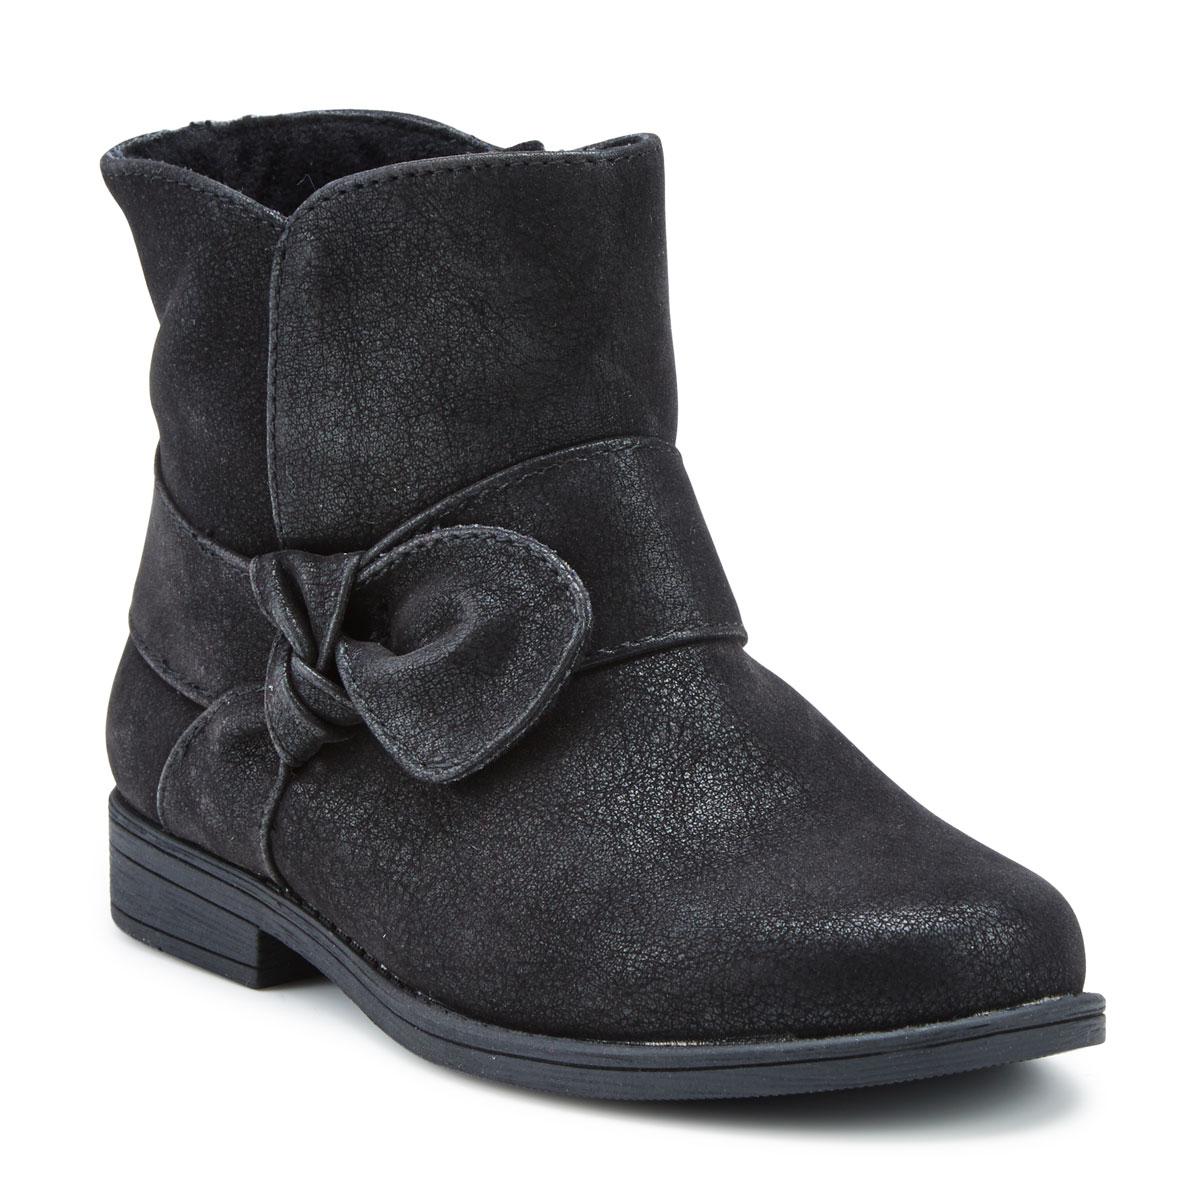 Rachel Shoes Toddler Girls' Lil Harlow Booties - Black, 10